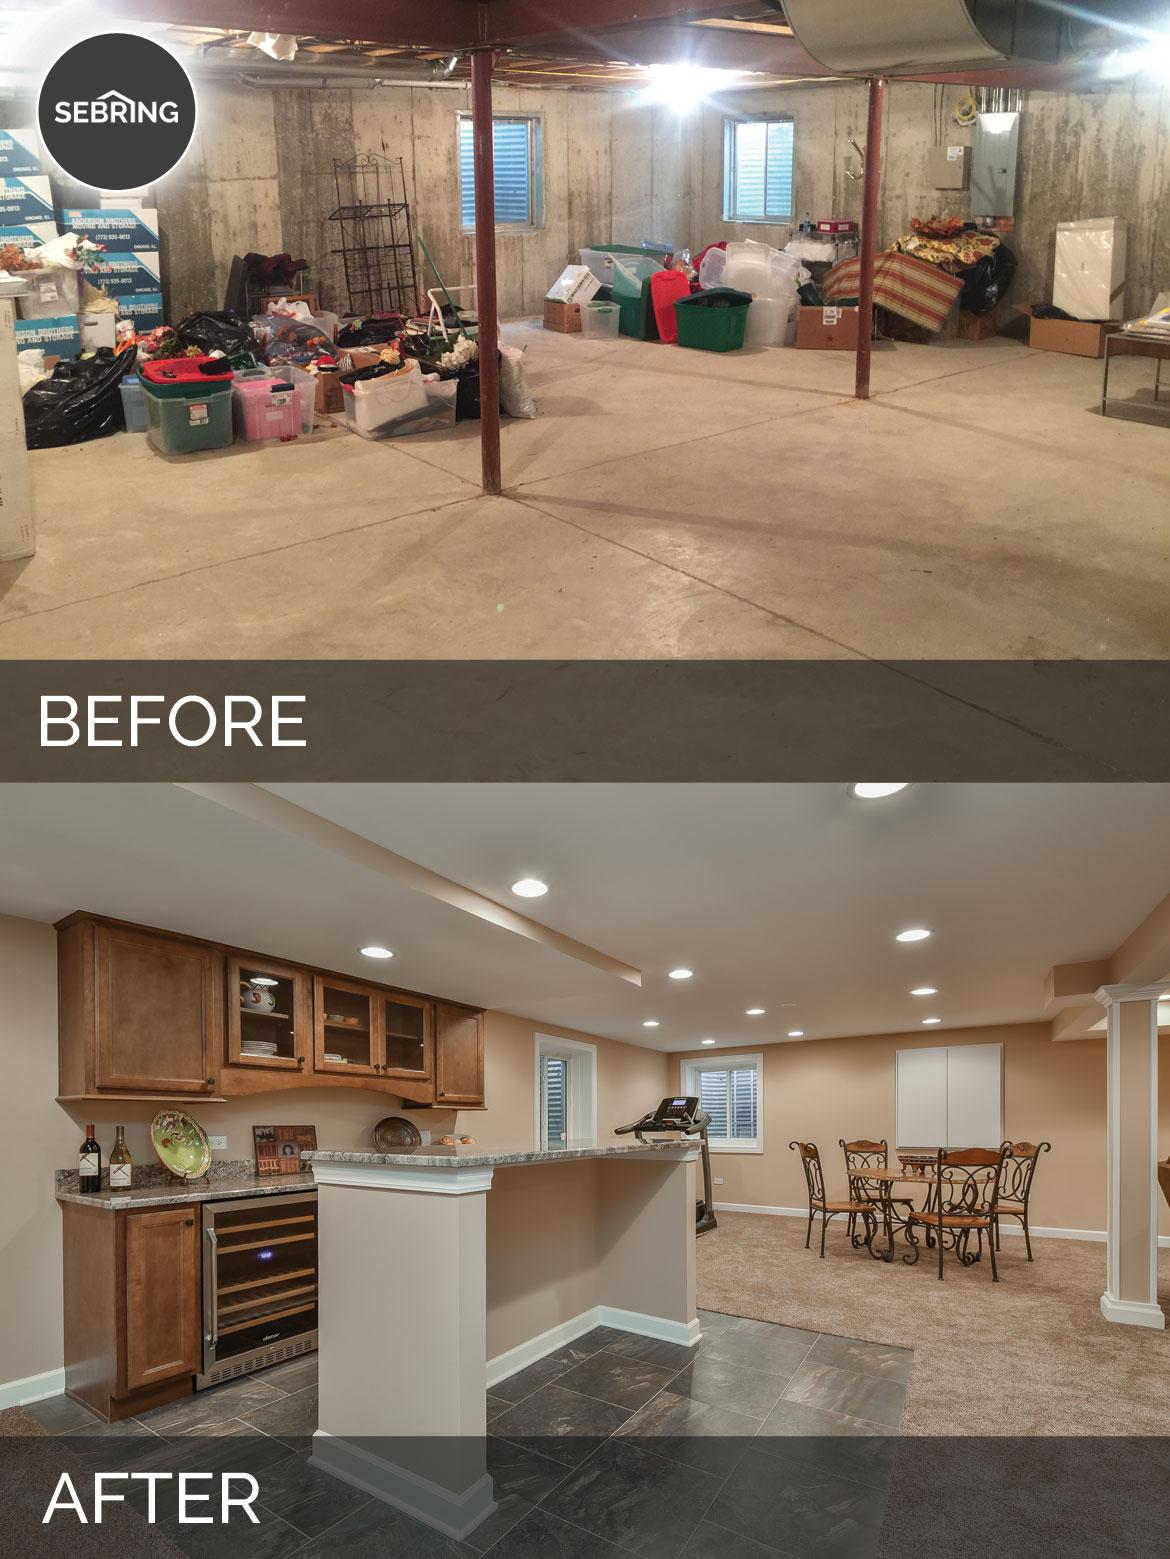 Carole S Basement Before After Pictures Home Remodeling Contractors Sebring Design Build